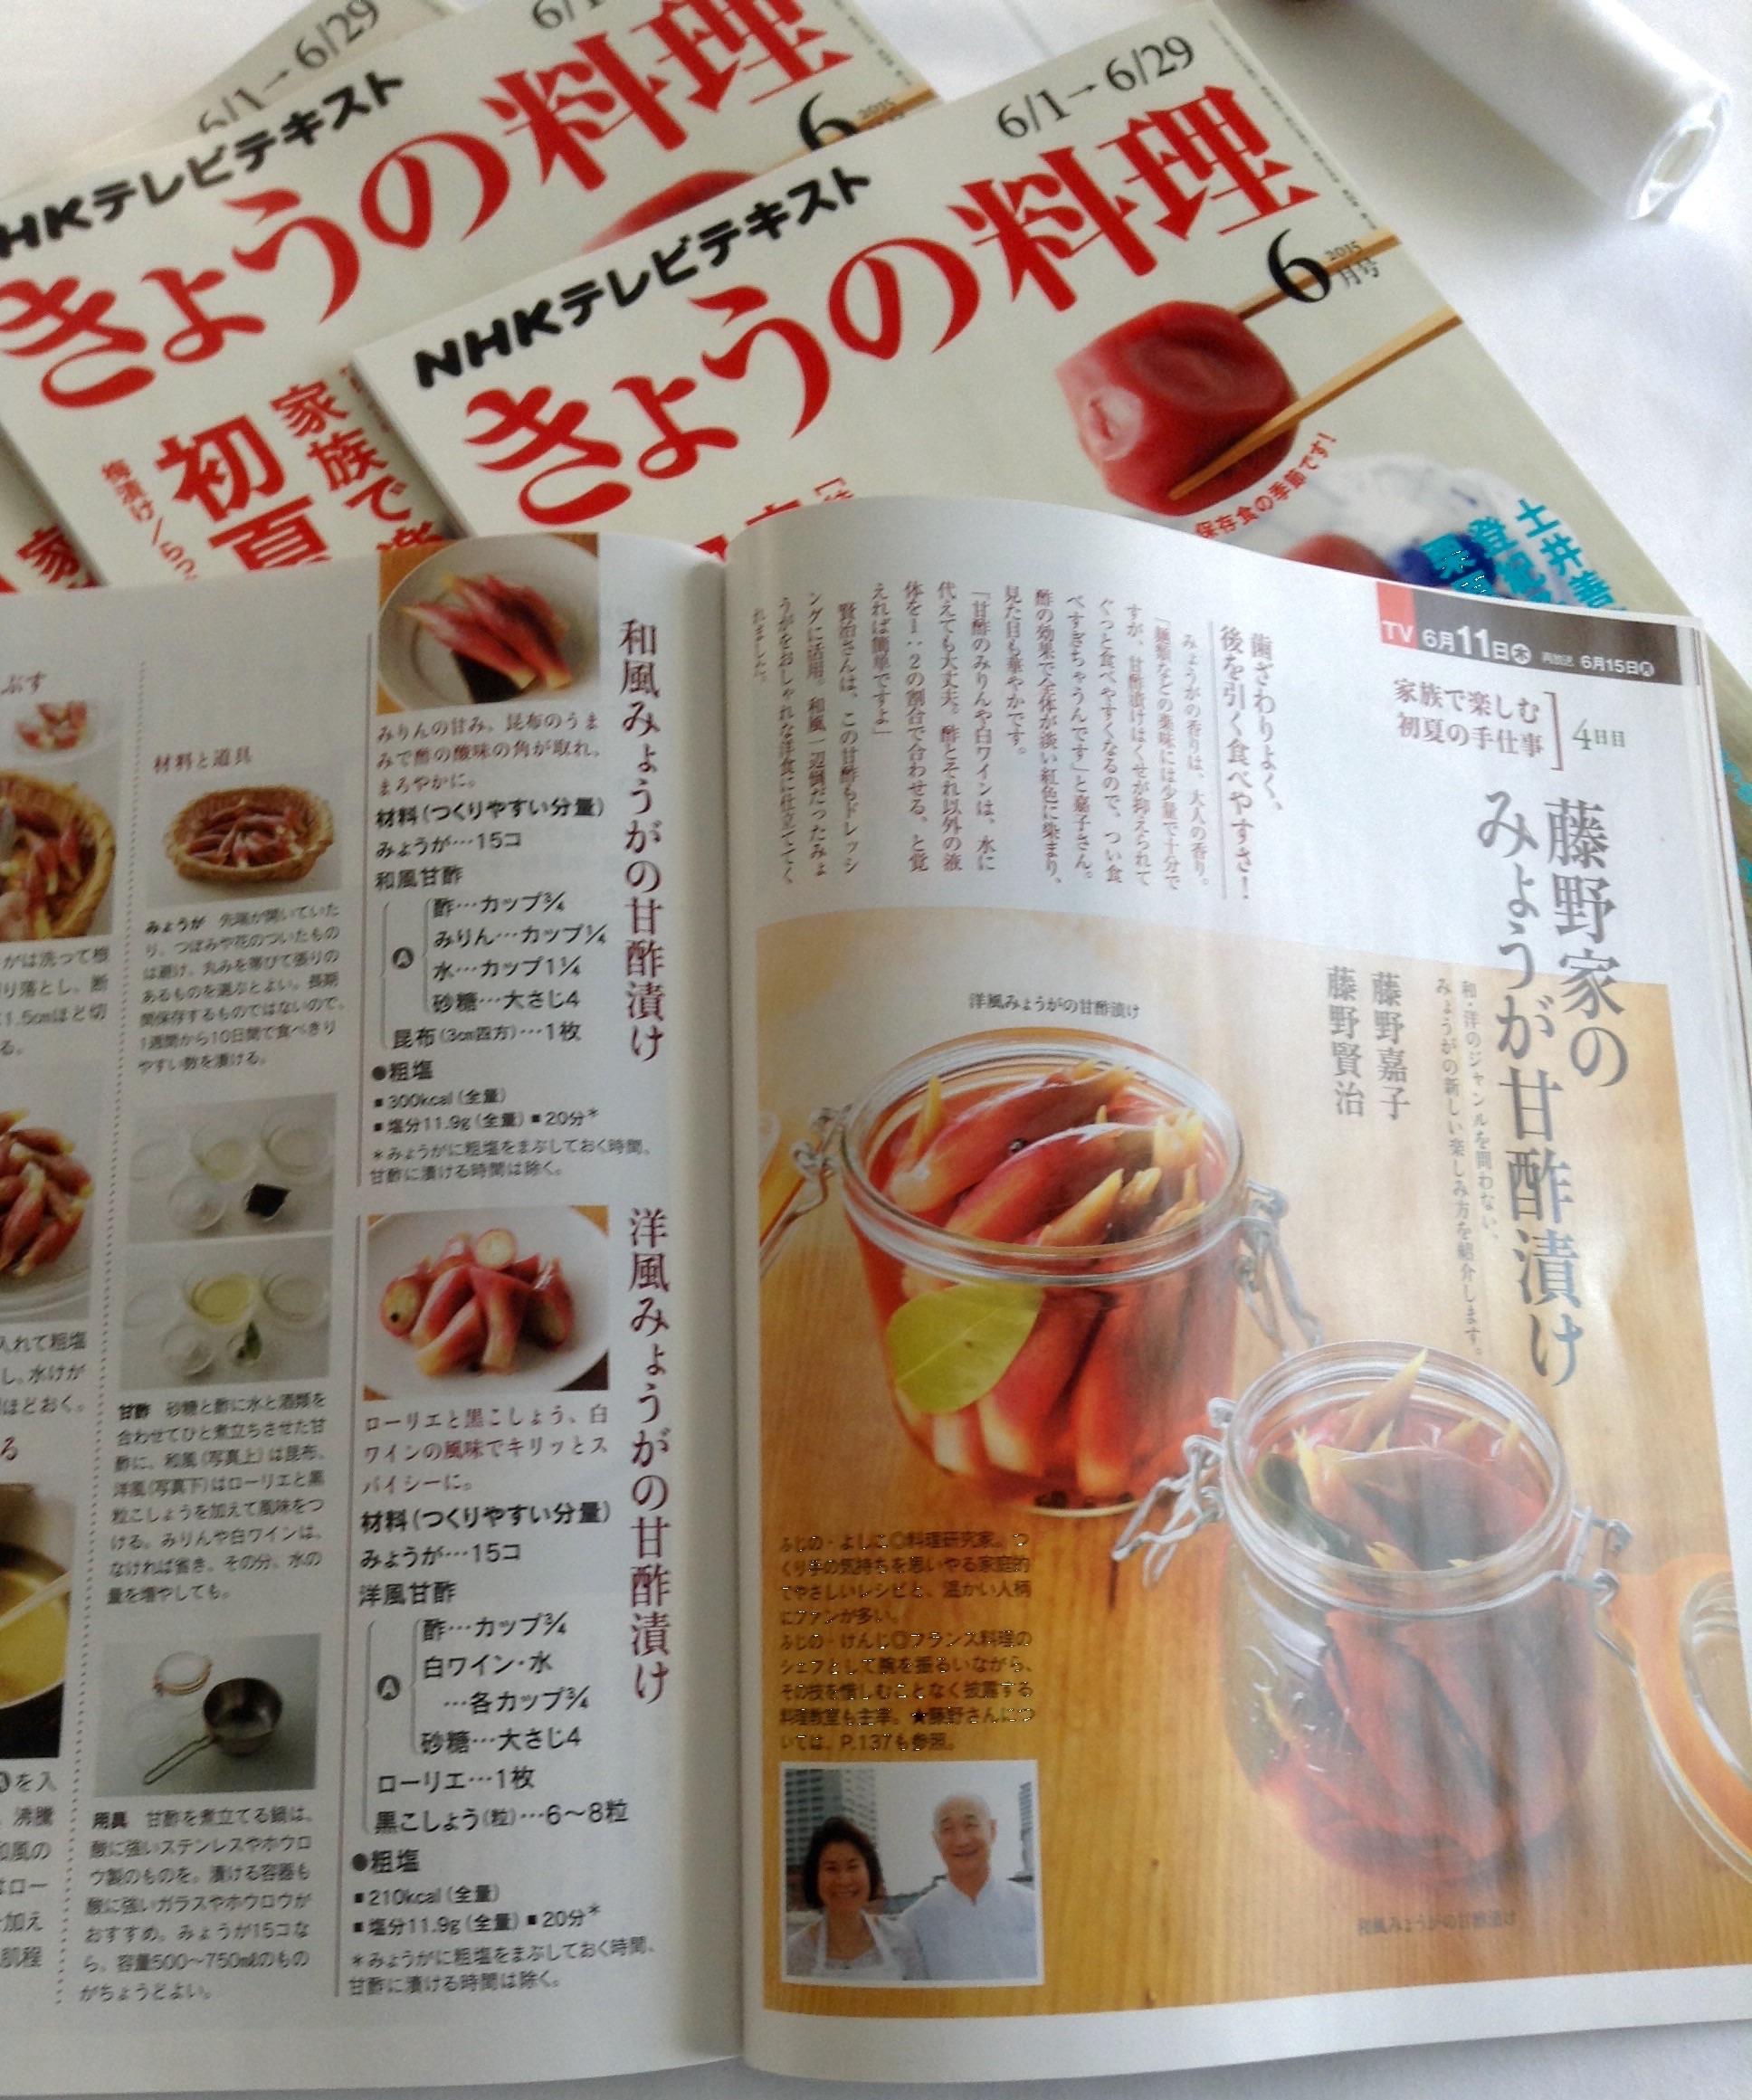 NHK「きょうの料理」テキスト ミョウガの甘酢漬け